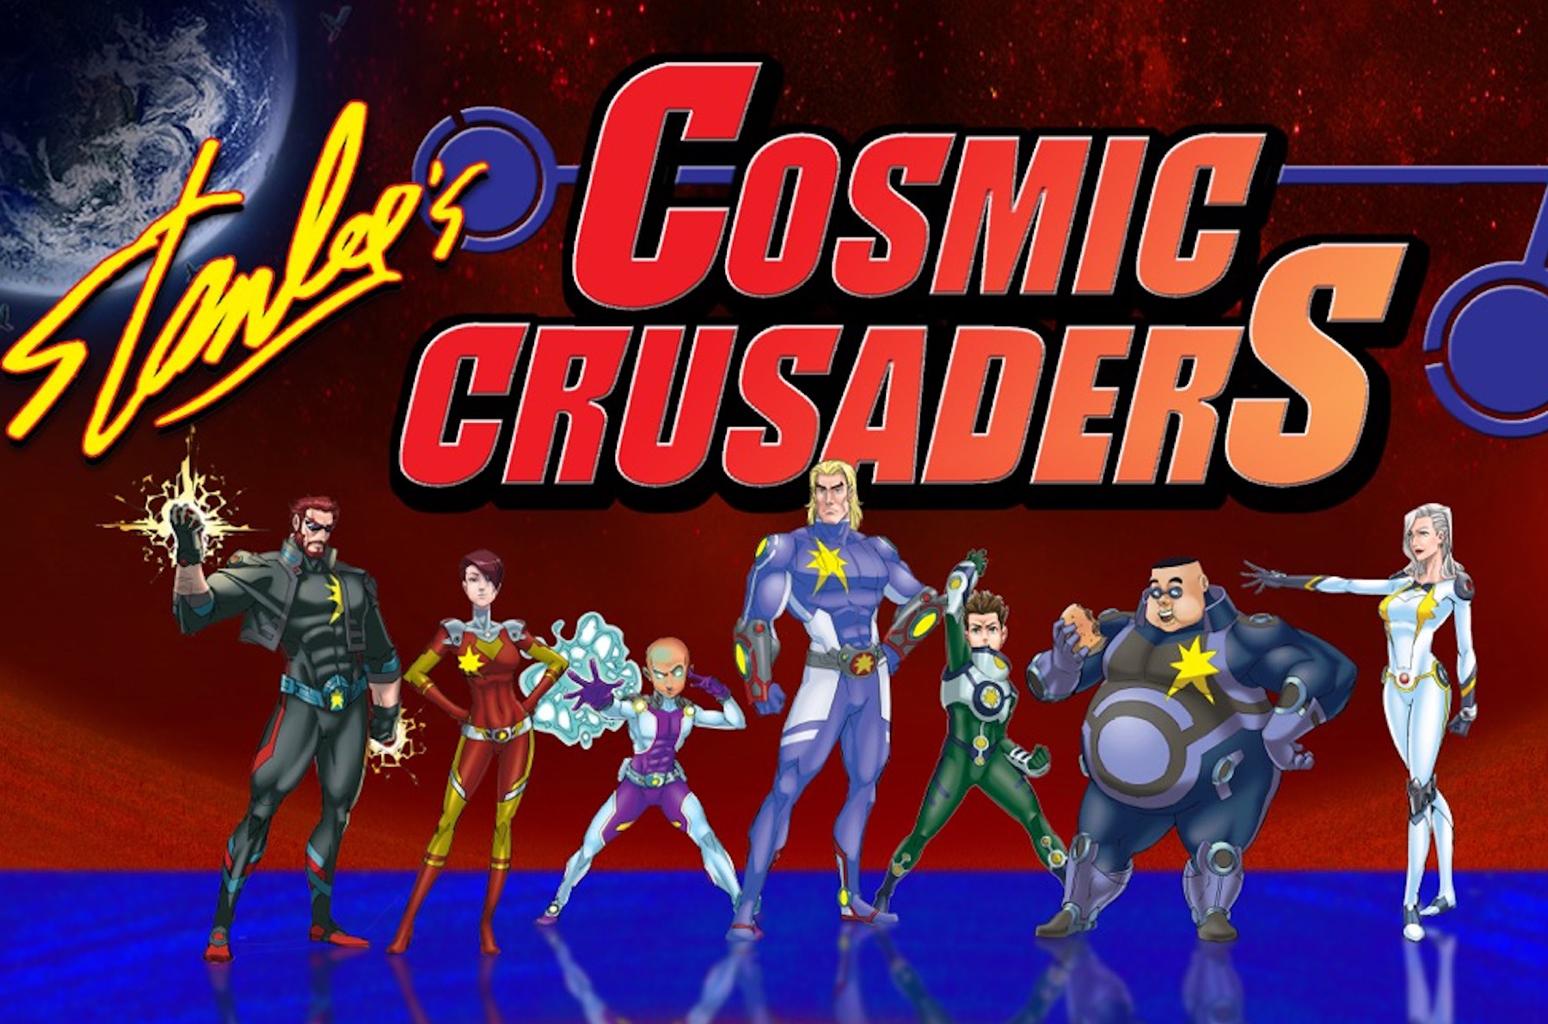 Stan Lee's Cosmic Crusaders - 2016    POW! Entertainment/Genius Brands